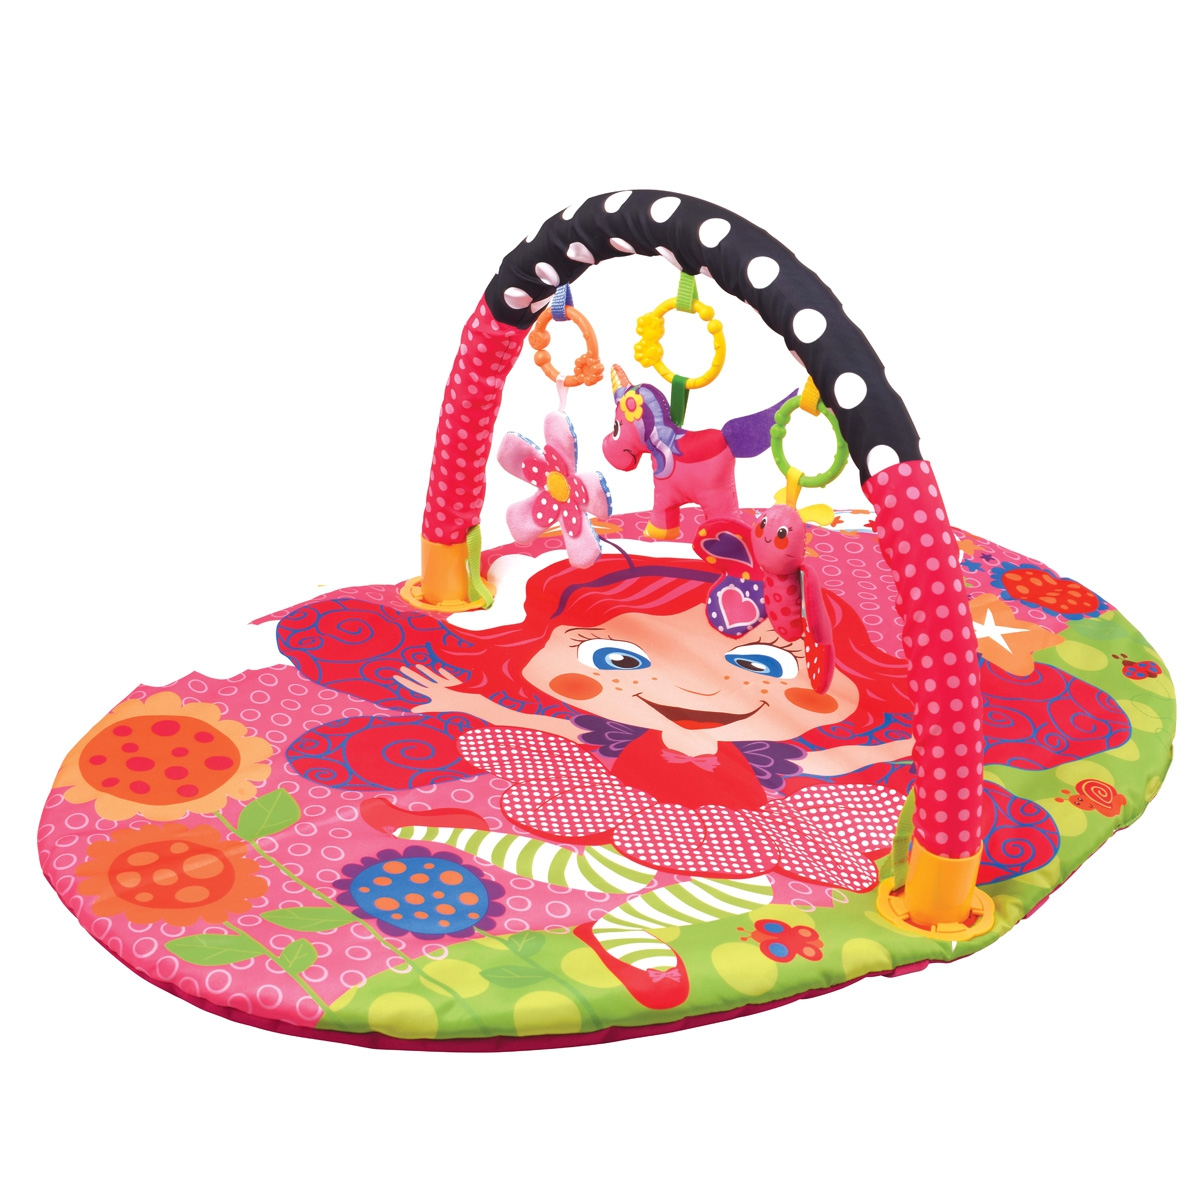 Развивающие коврики Ути Пути Цветочная принцесса развивающий коврик ути пути цветущий сад